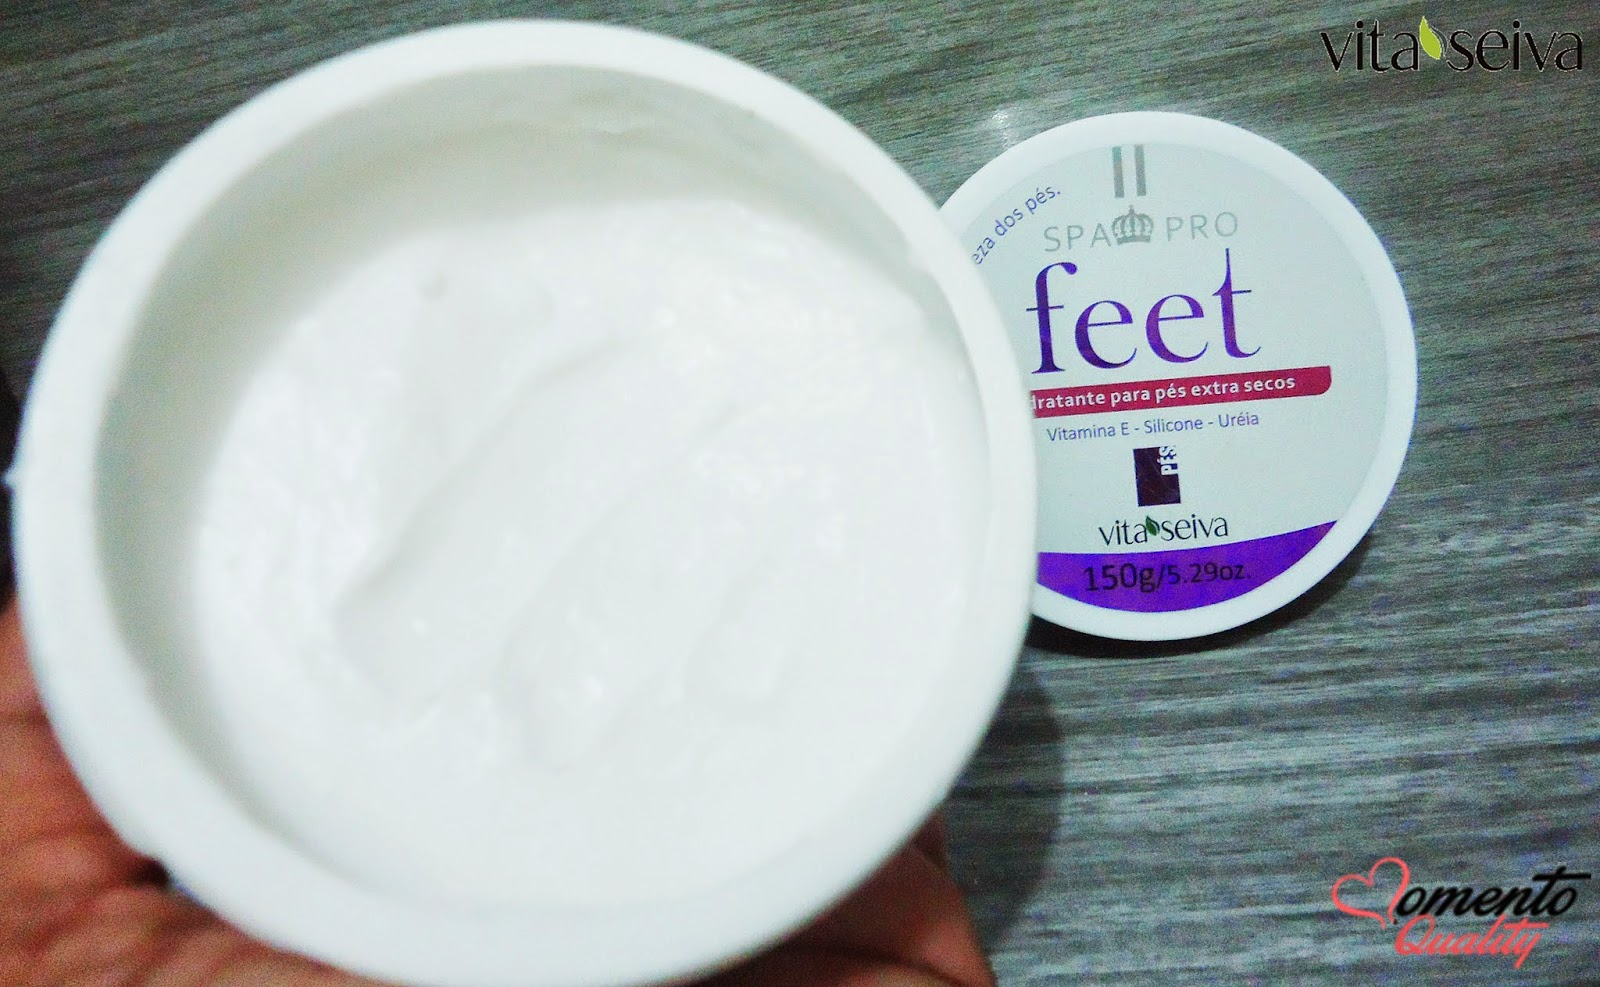 Spa Pro Feet Vita Seiva